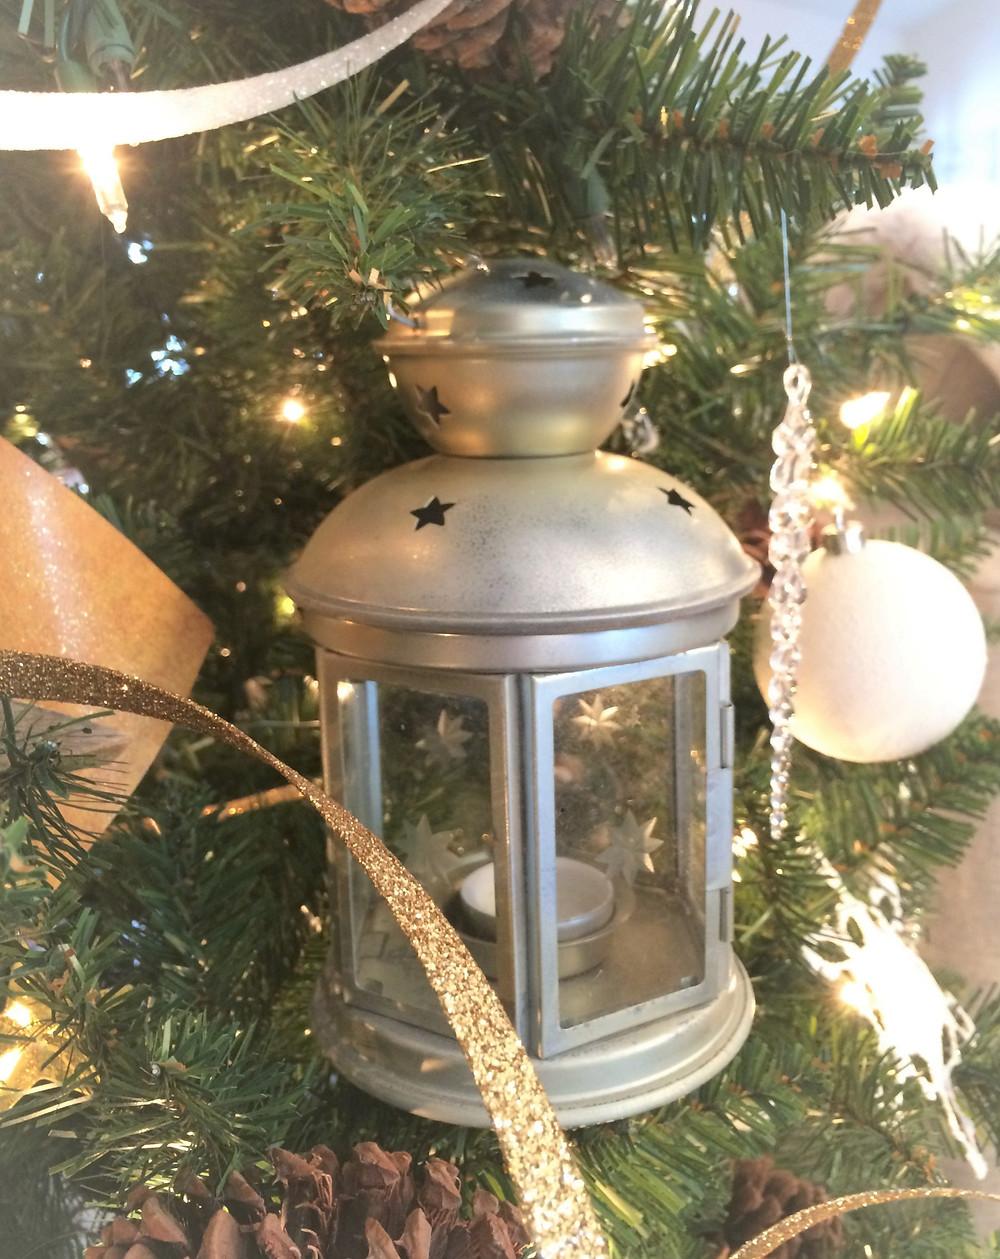 lanterns on a Christmas tree